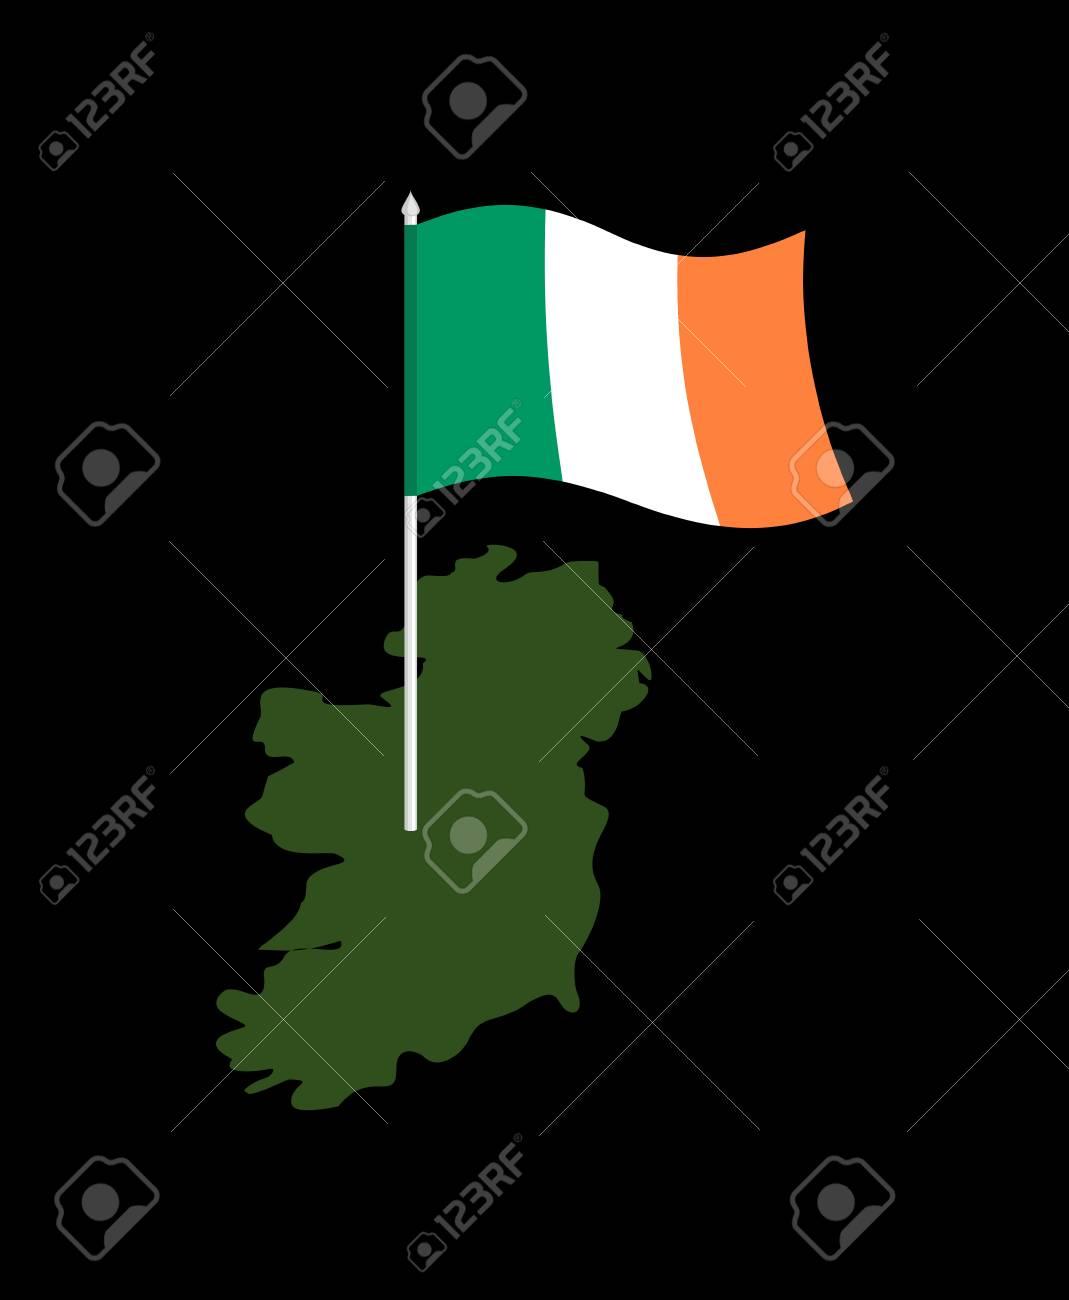 Ireland Map And Flag Irish Banner And Land Territory State